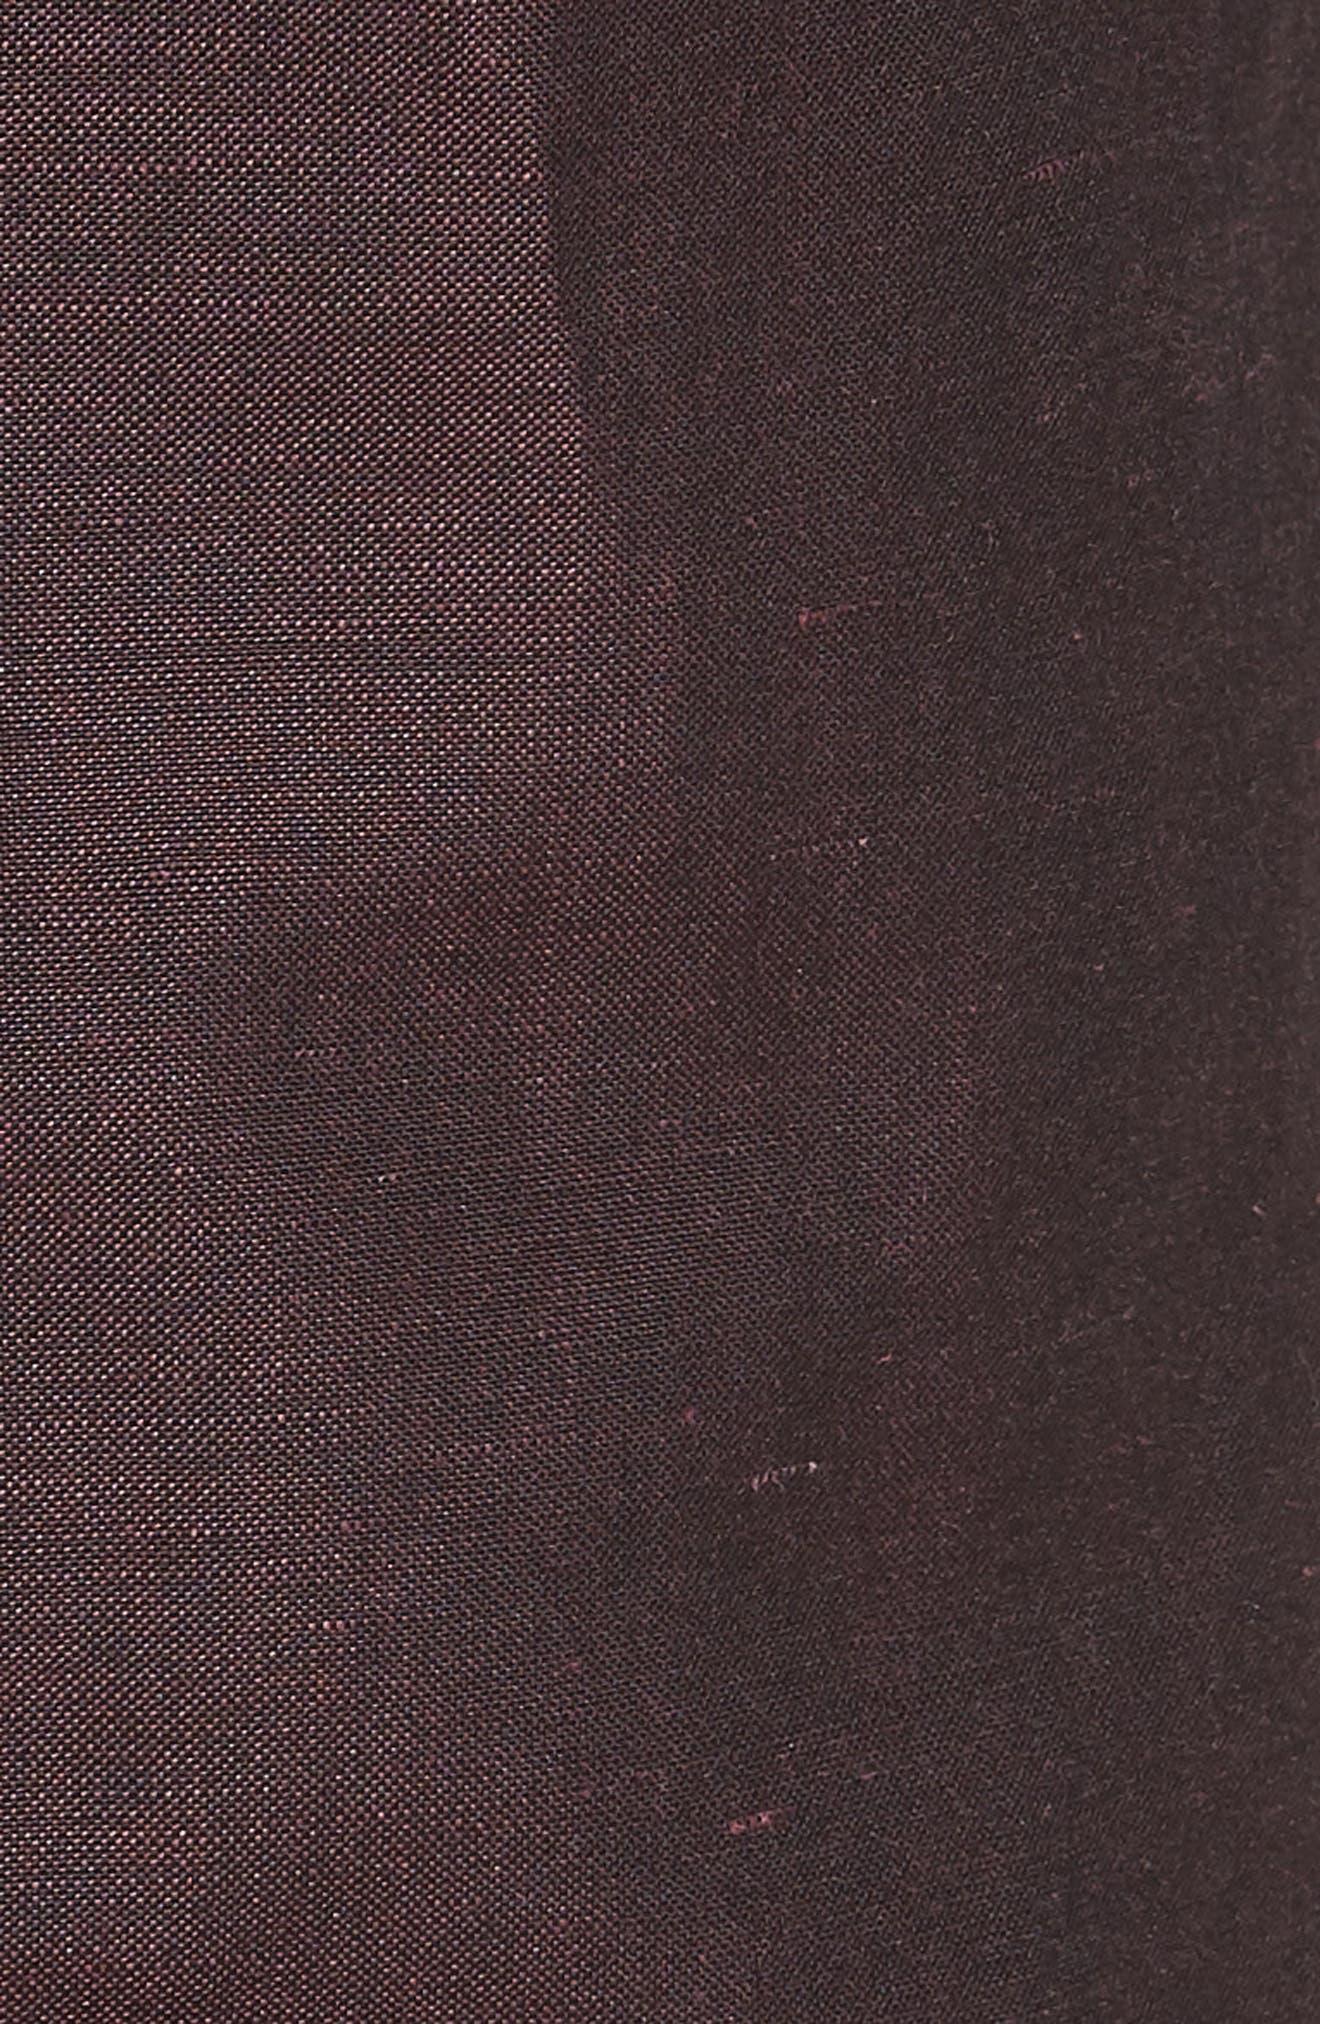 Dagger Flat Front Solid Wool & Linen Trousers,                             Alternate thumbnail 5, color,                             Plum